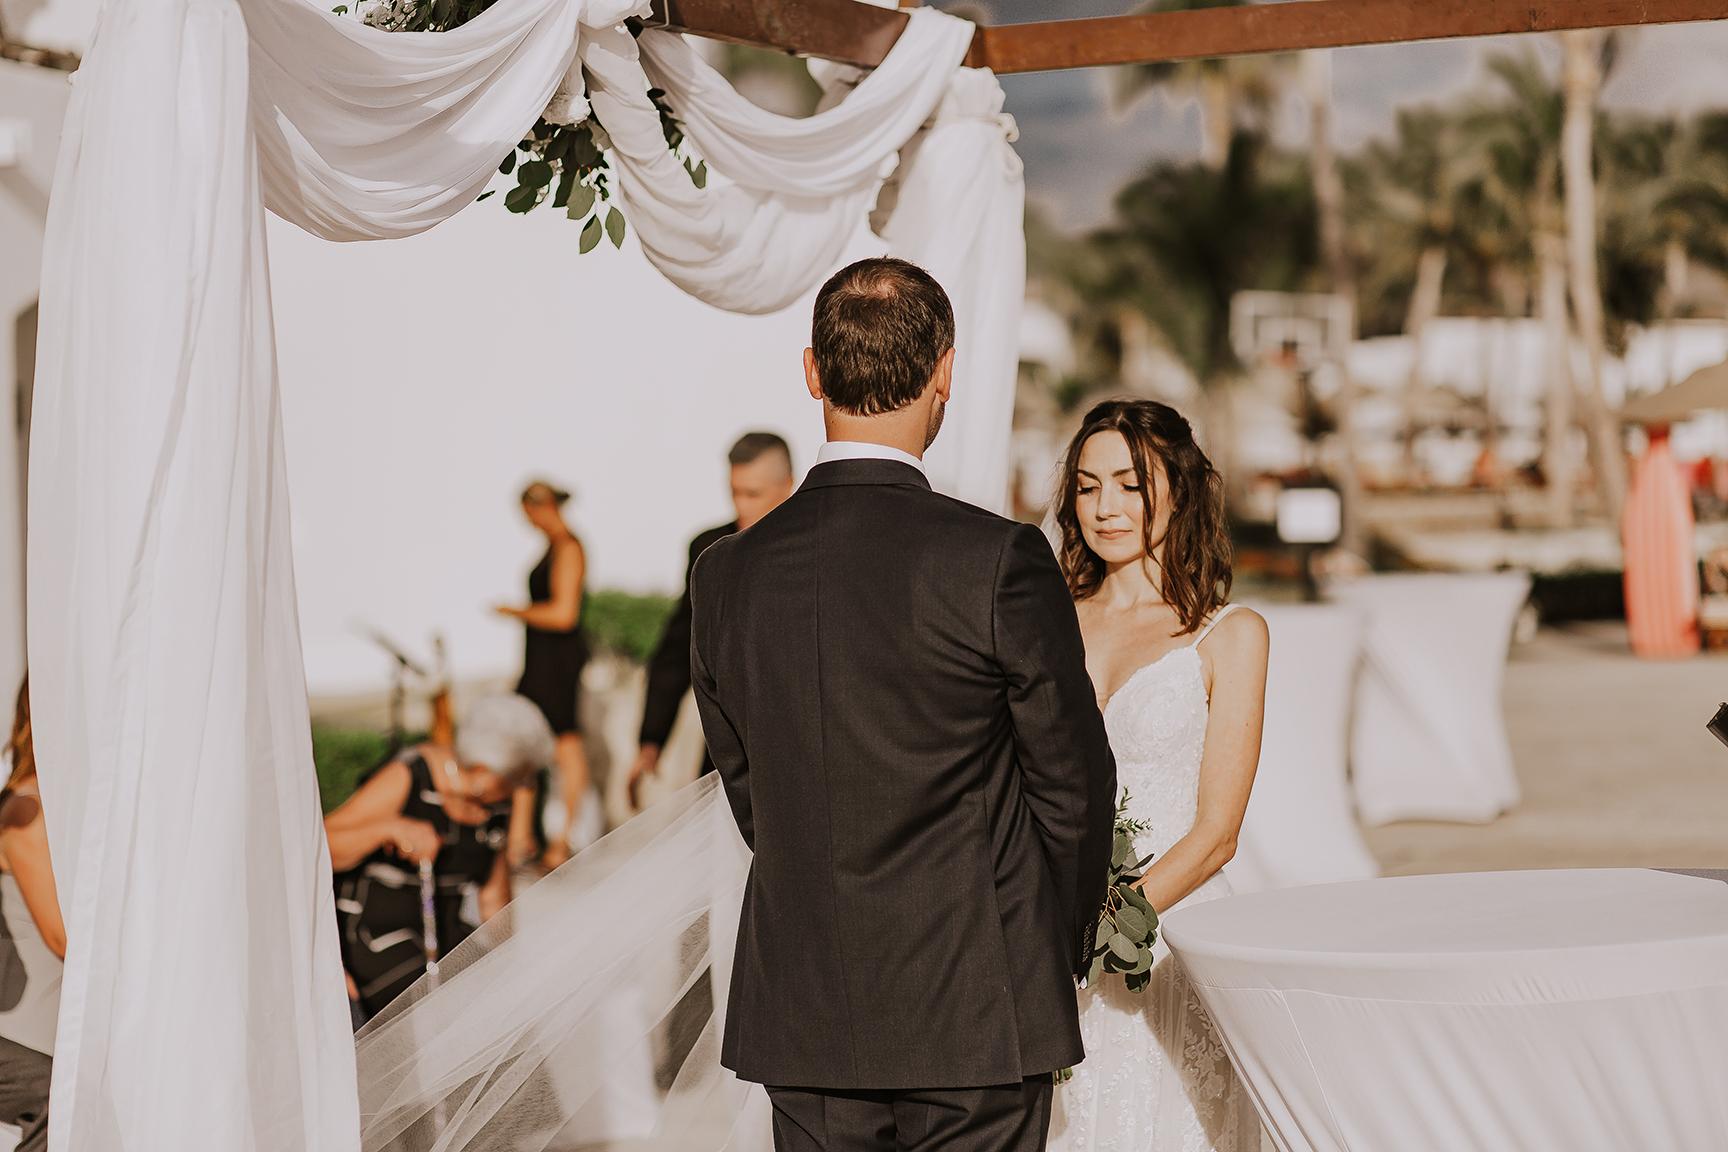 Lindsei+James_cabo_wedding_519.jpg